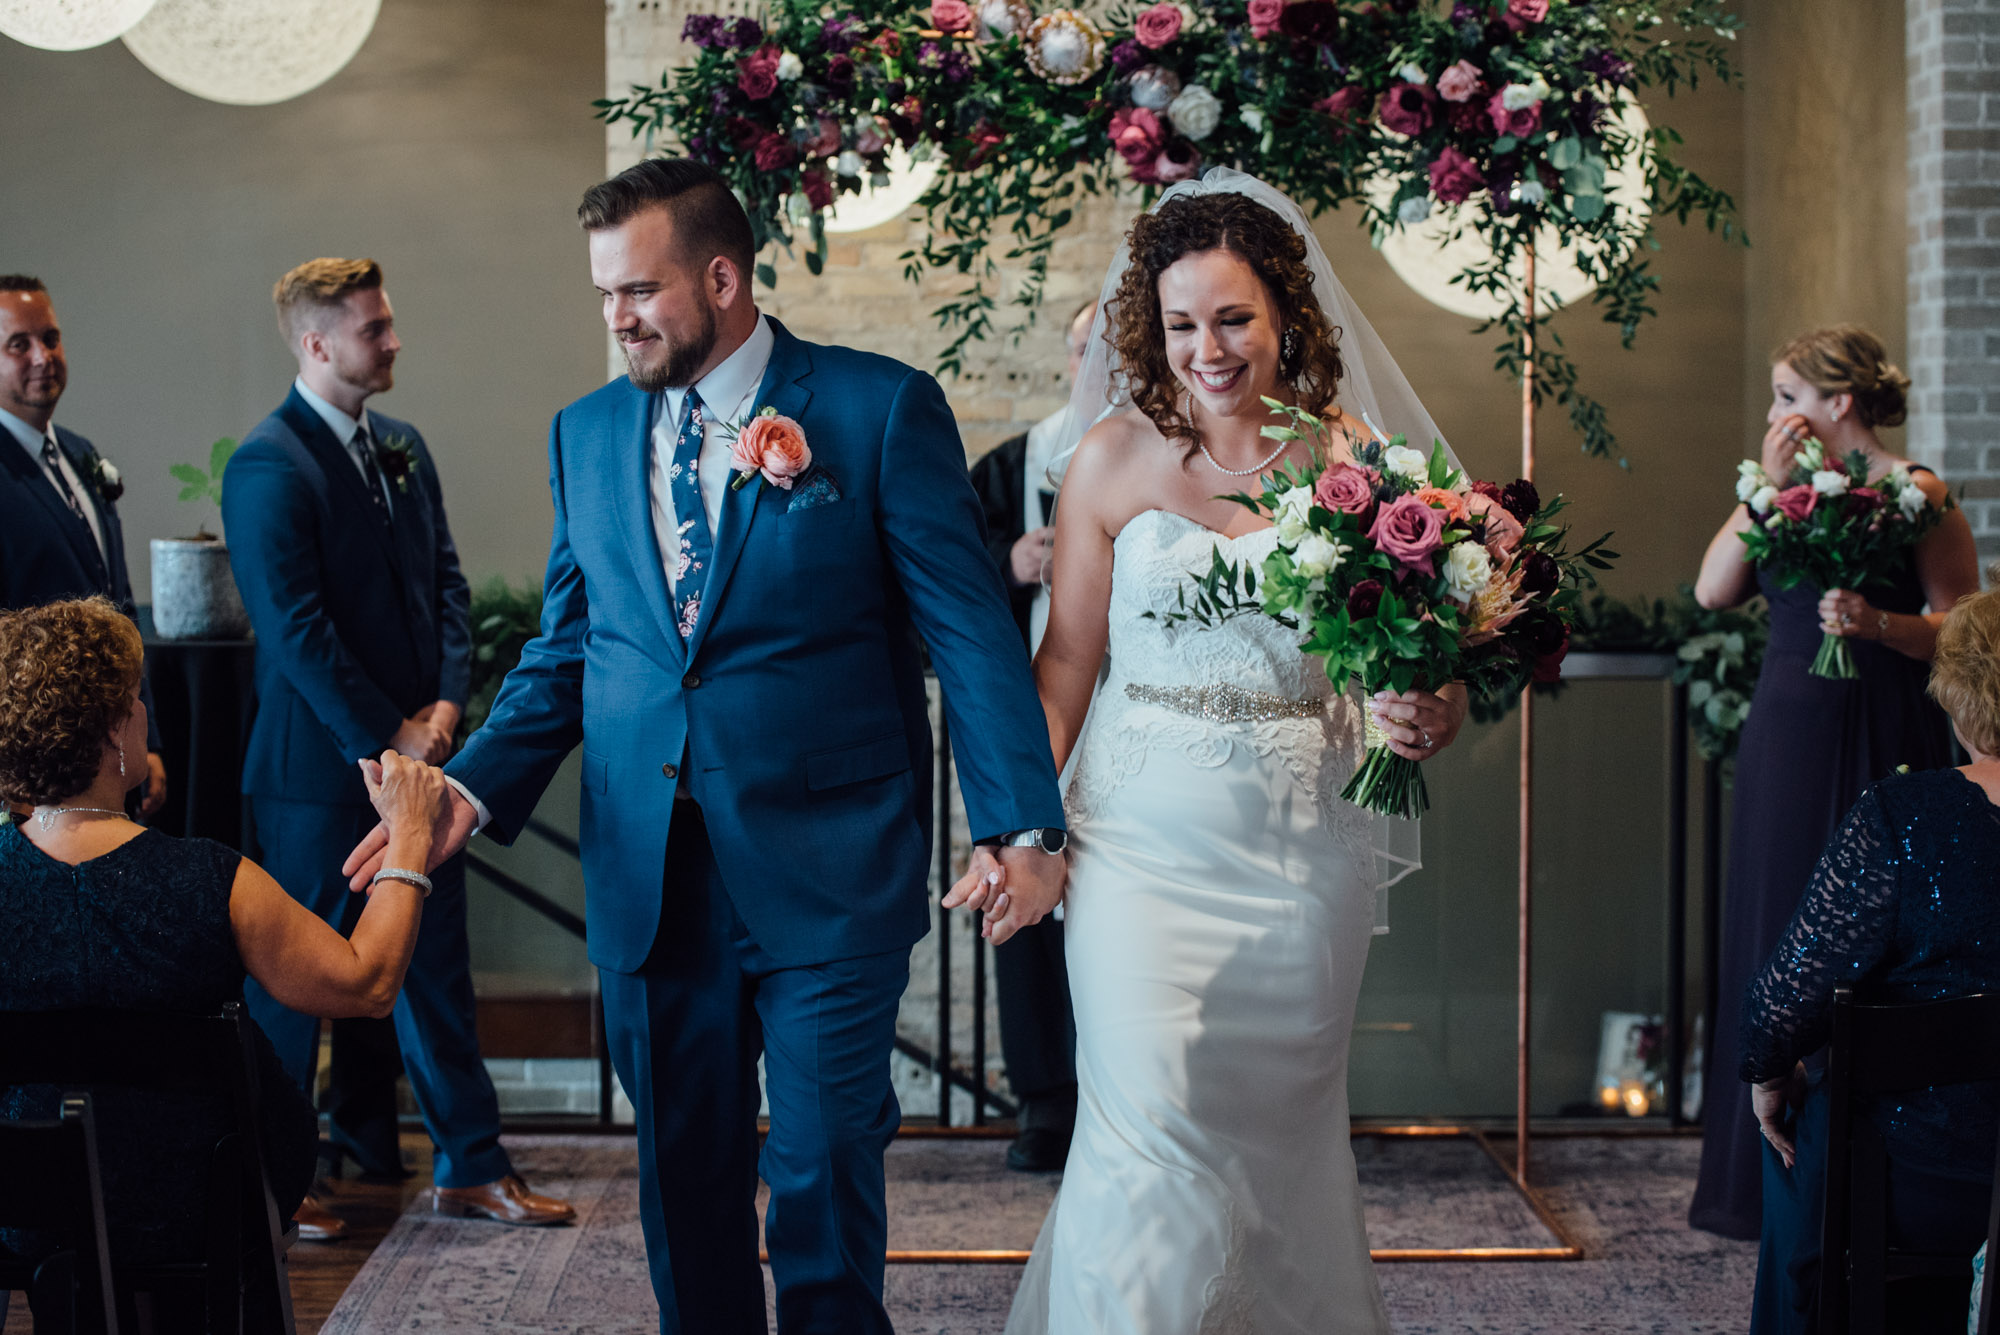 five-event-center-wedding-photographe-1-3.jpg